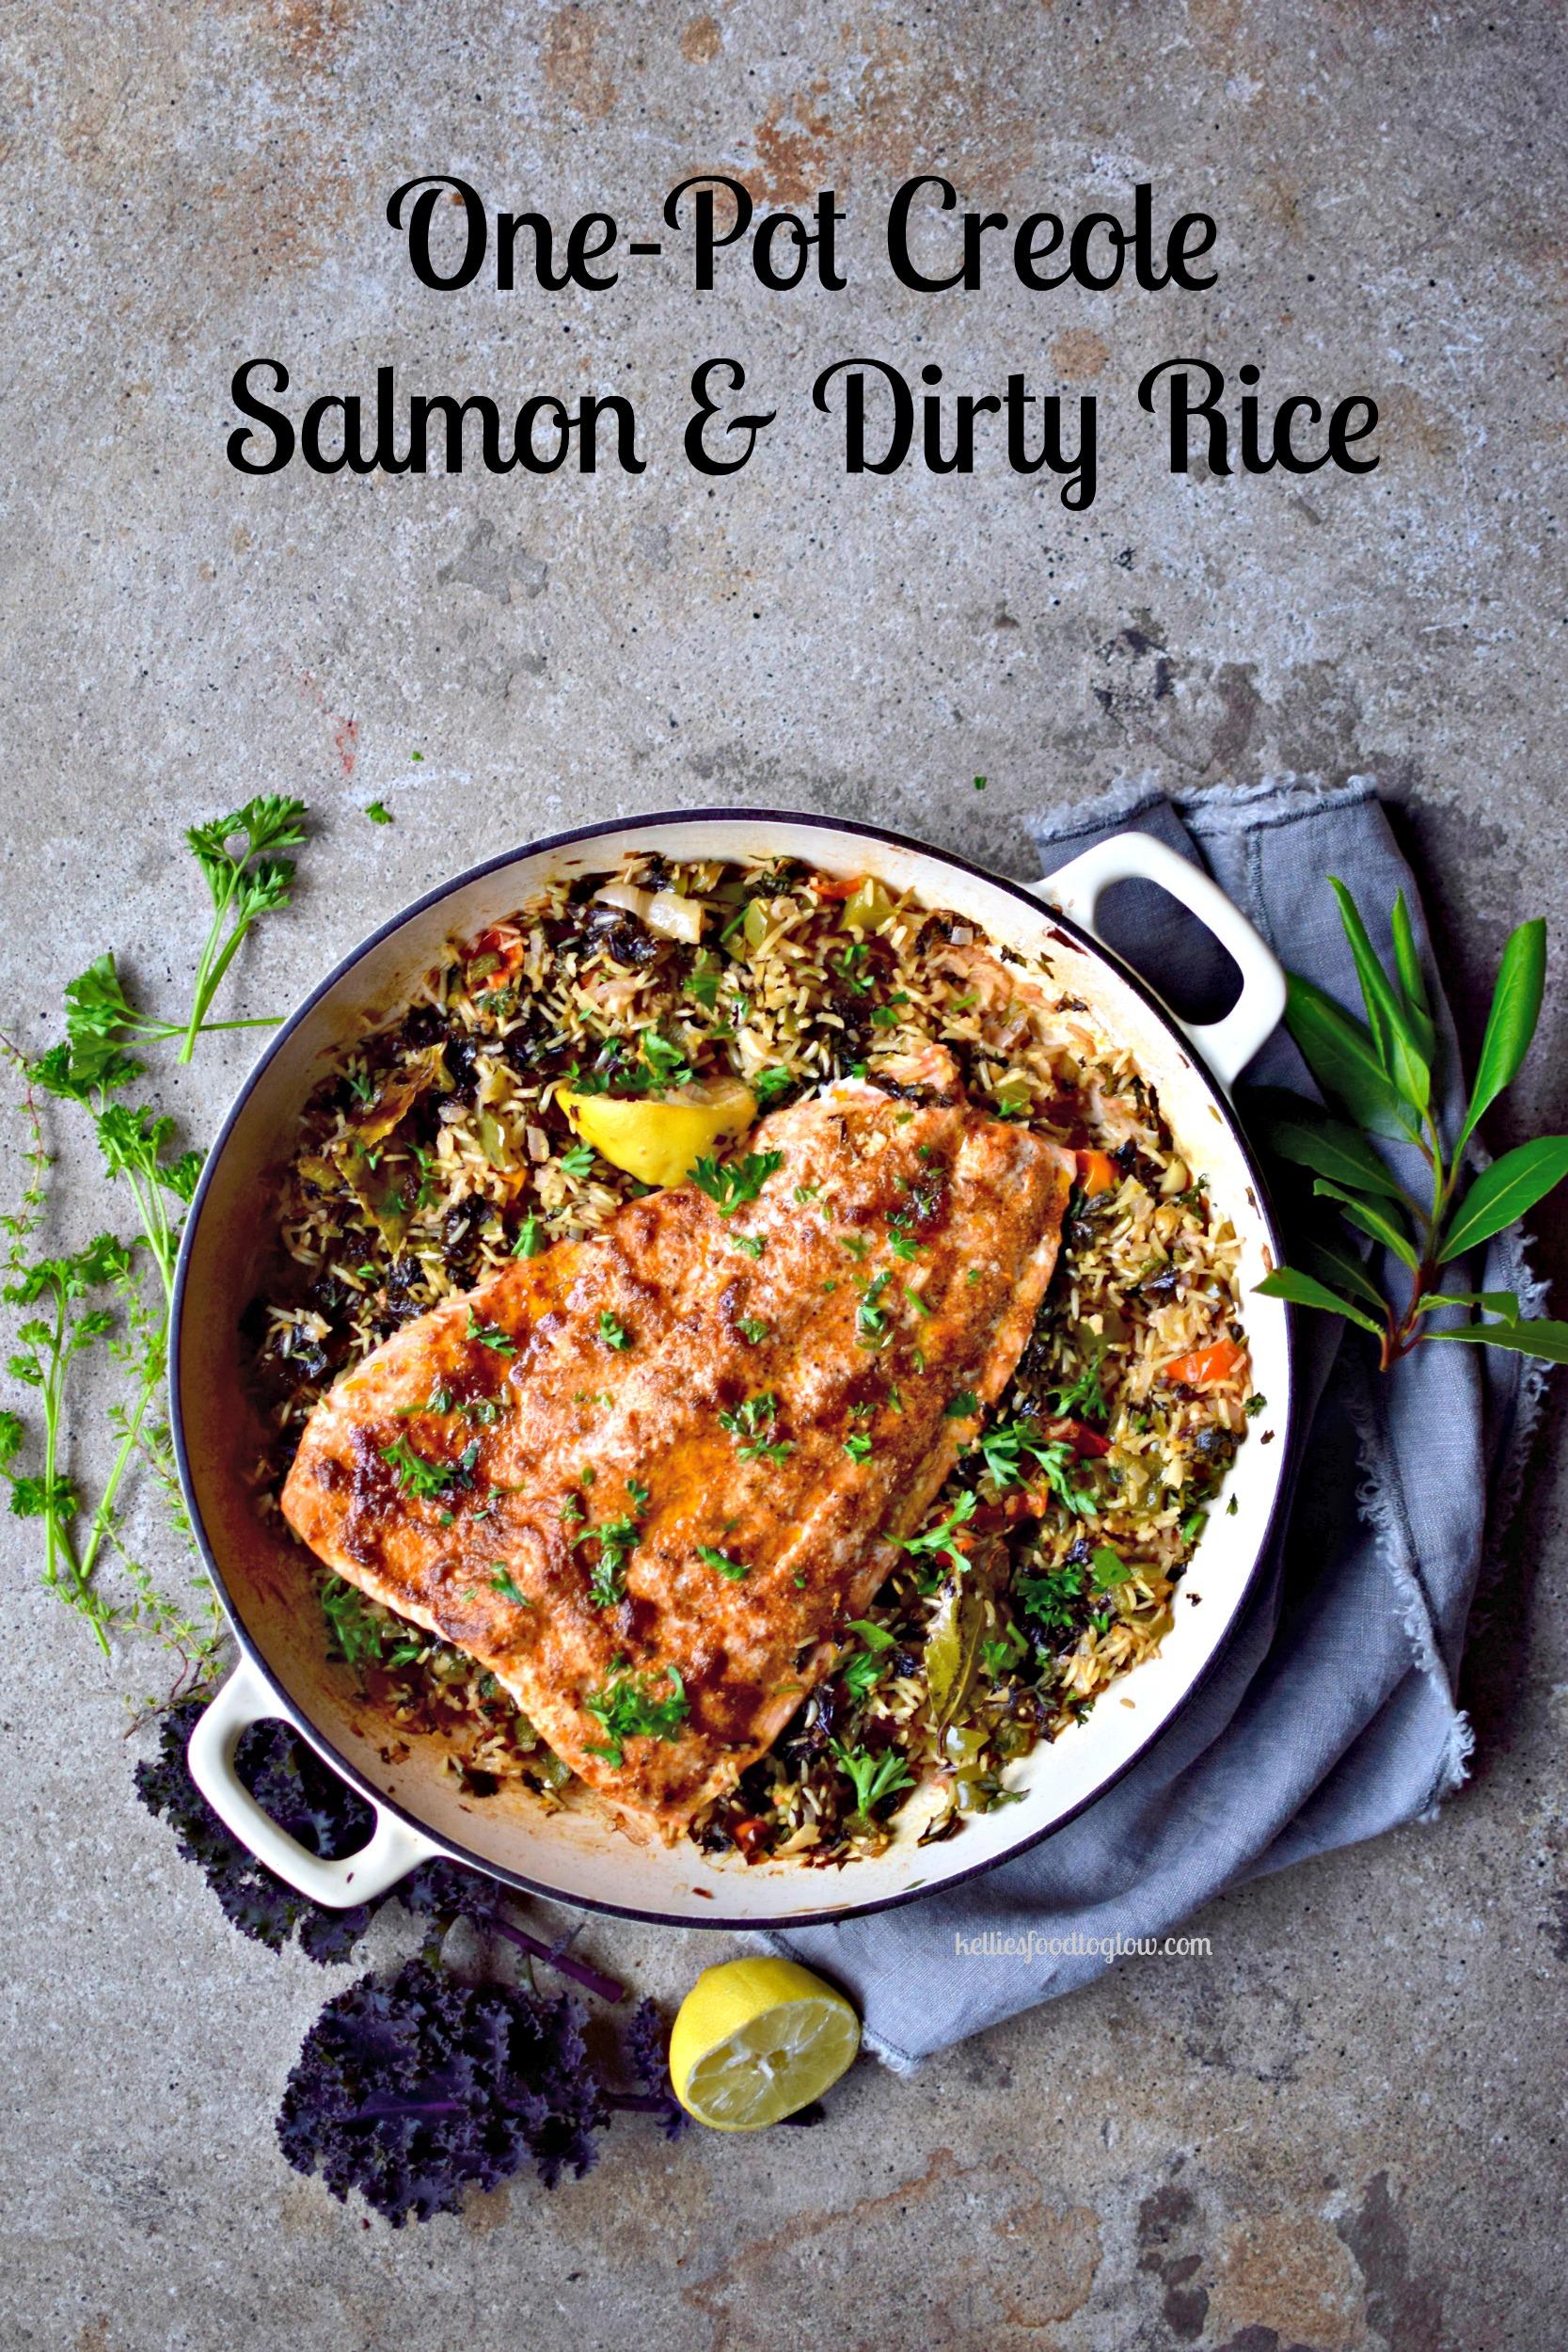 Simple shrove tuesday recipes for salmon